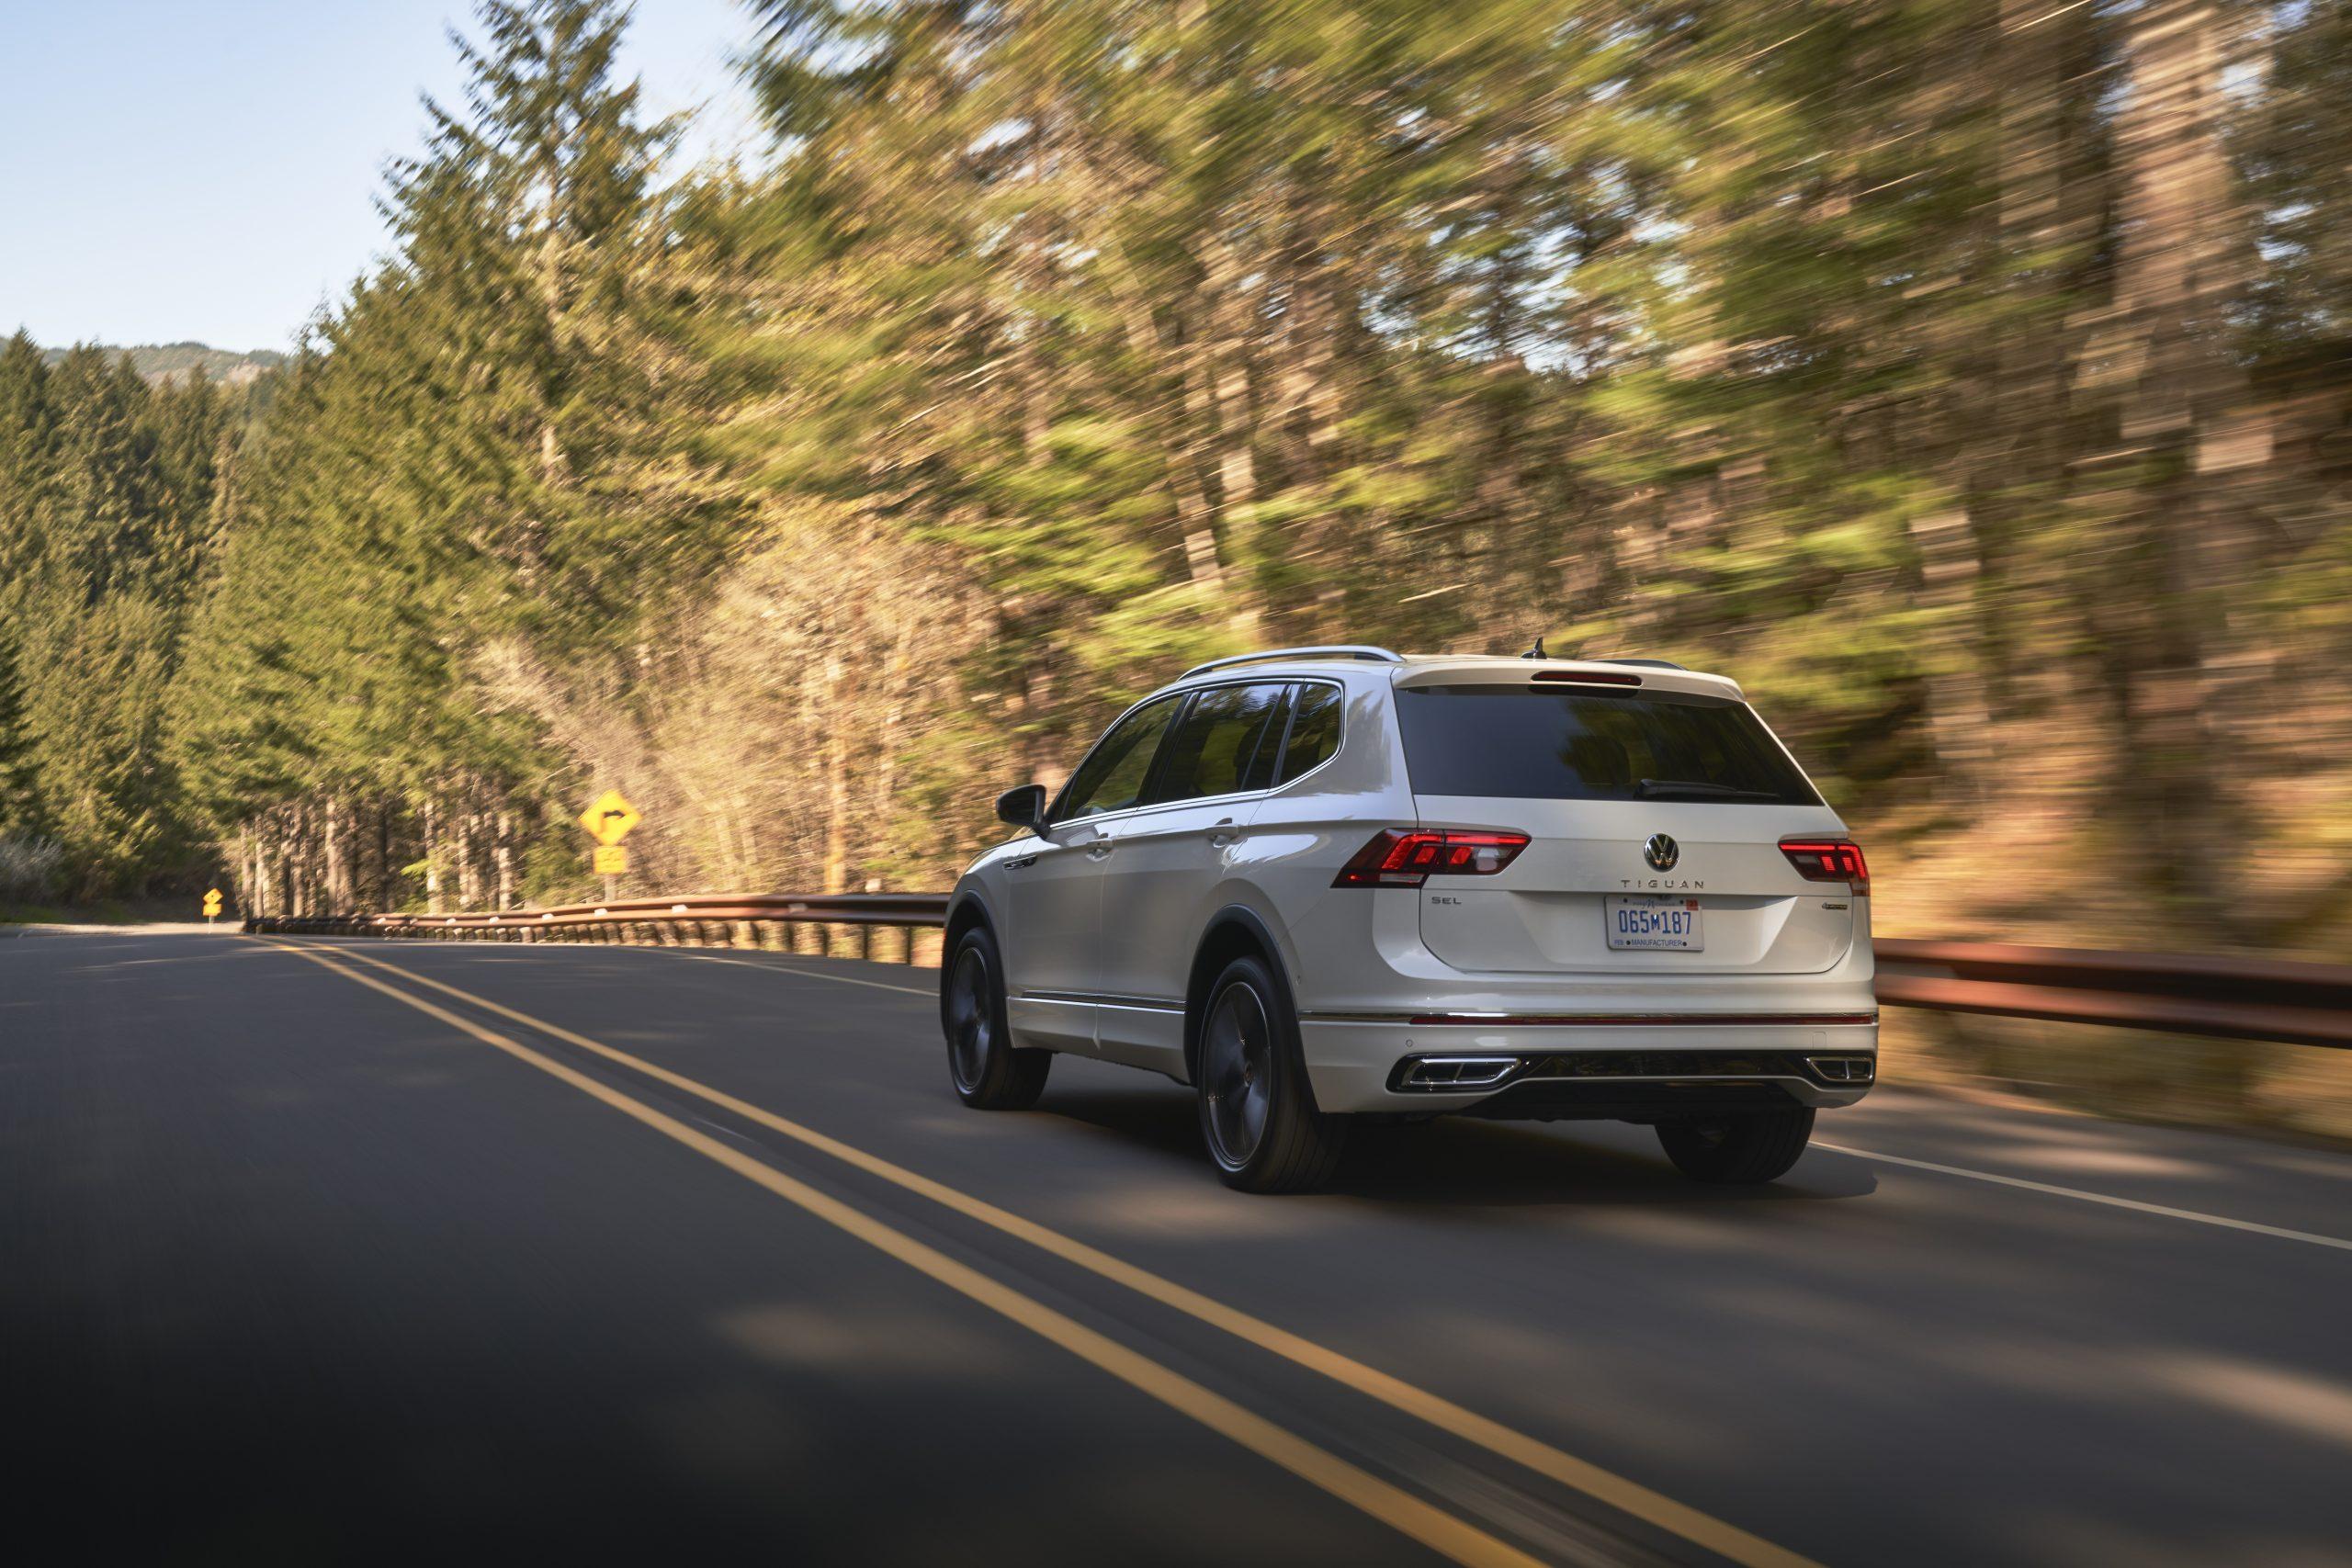 2022 VW Tiguan facelift rolling outside